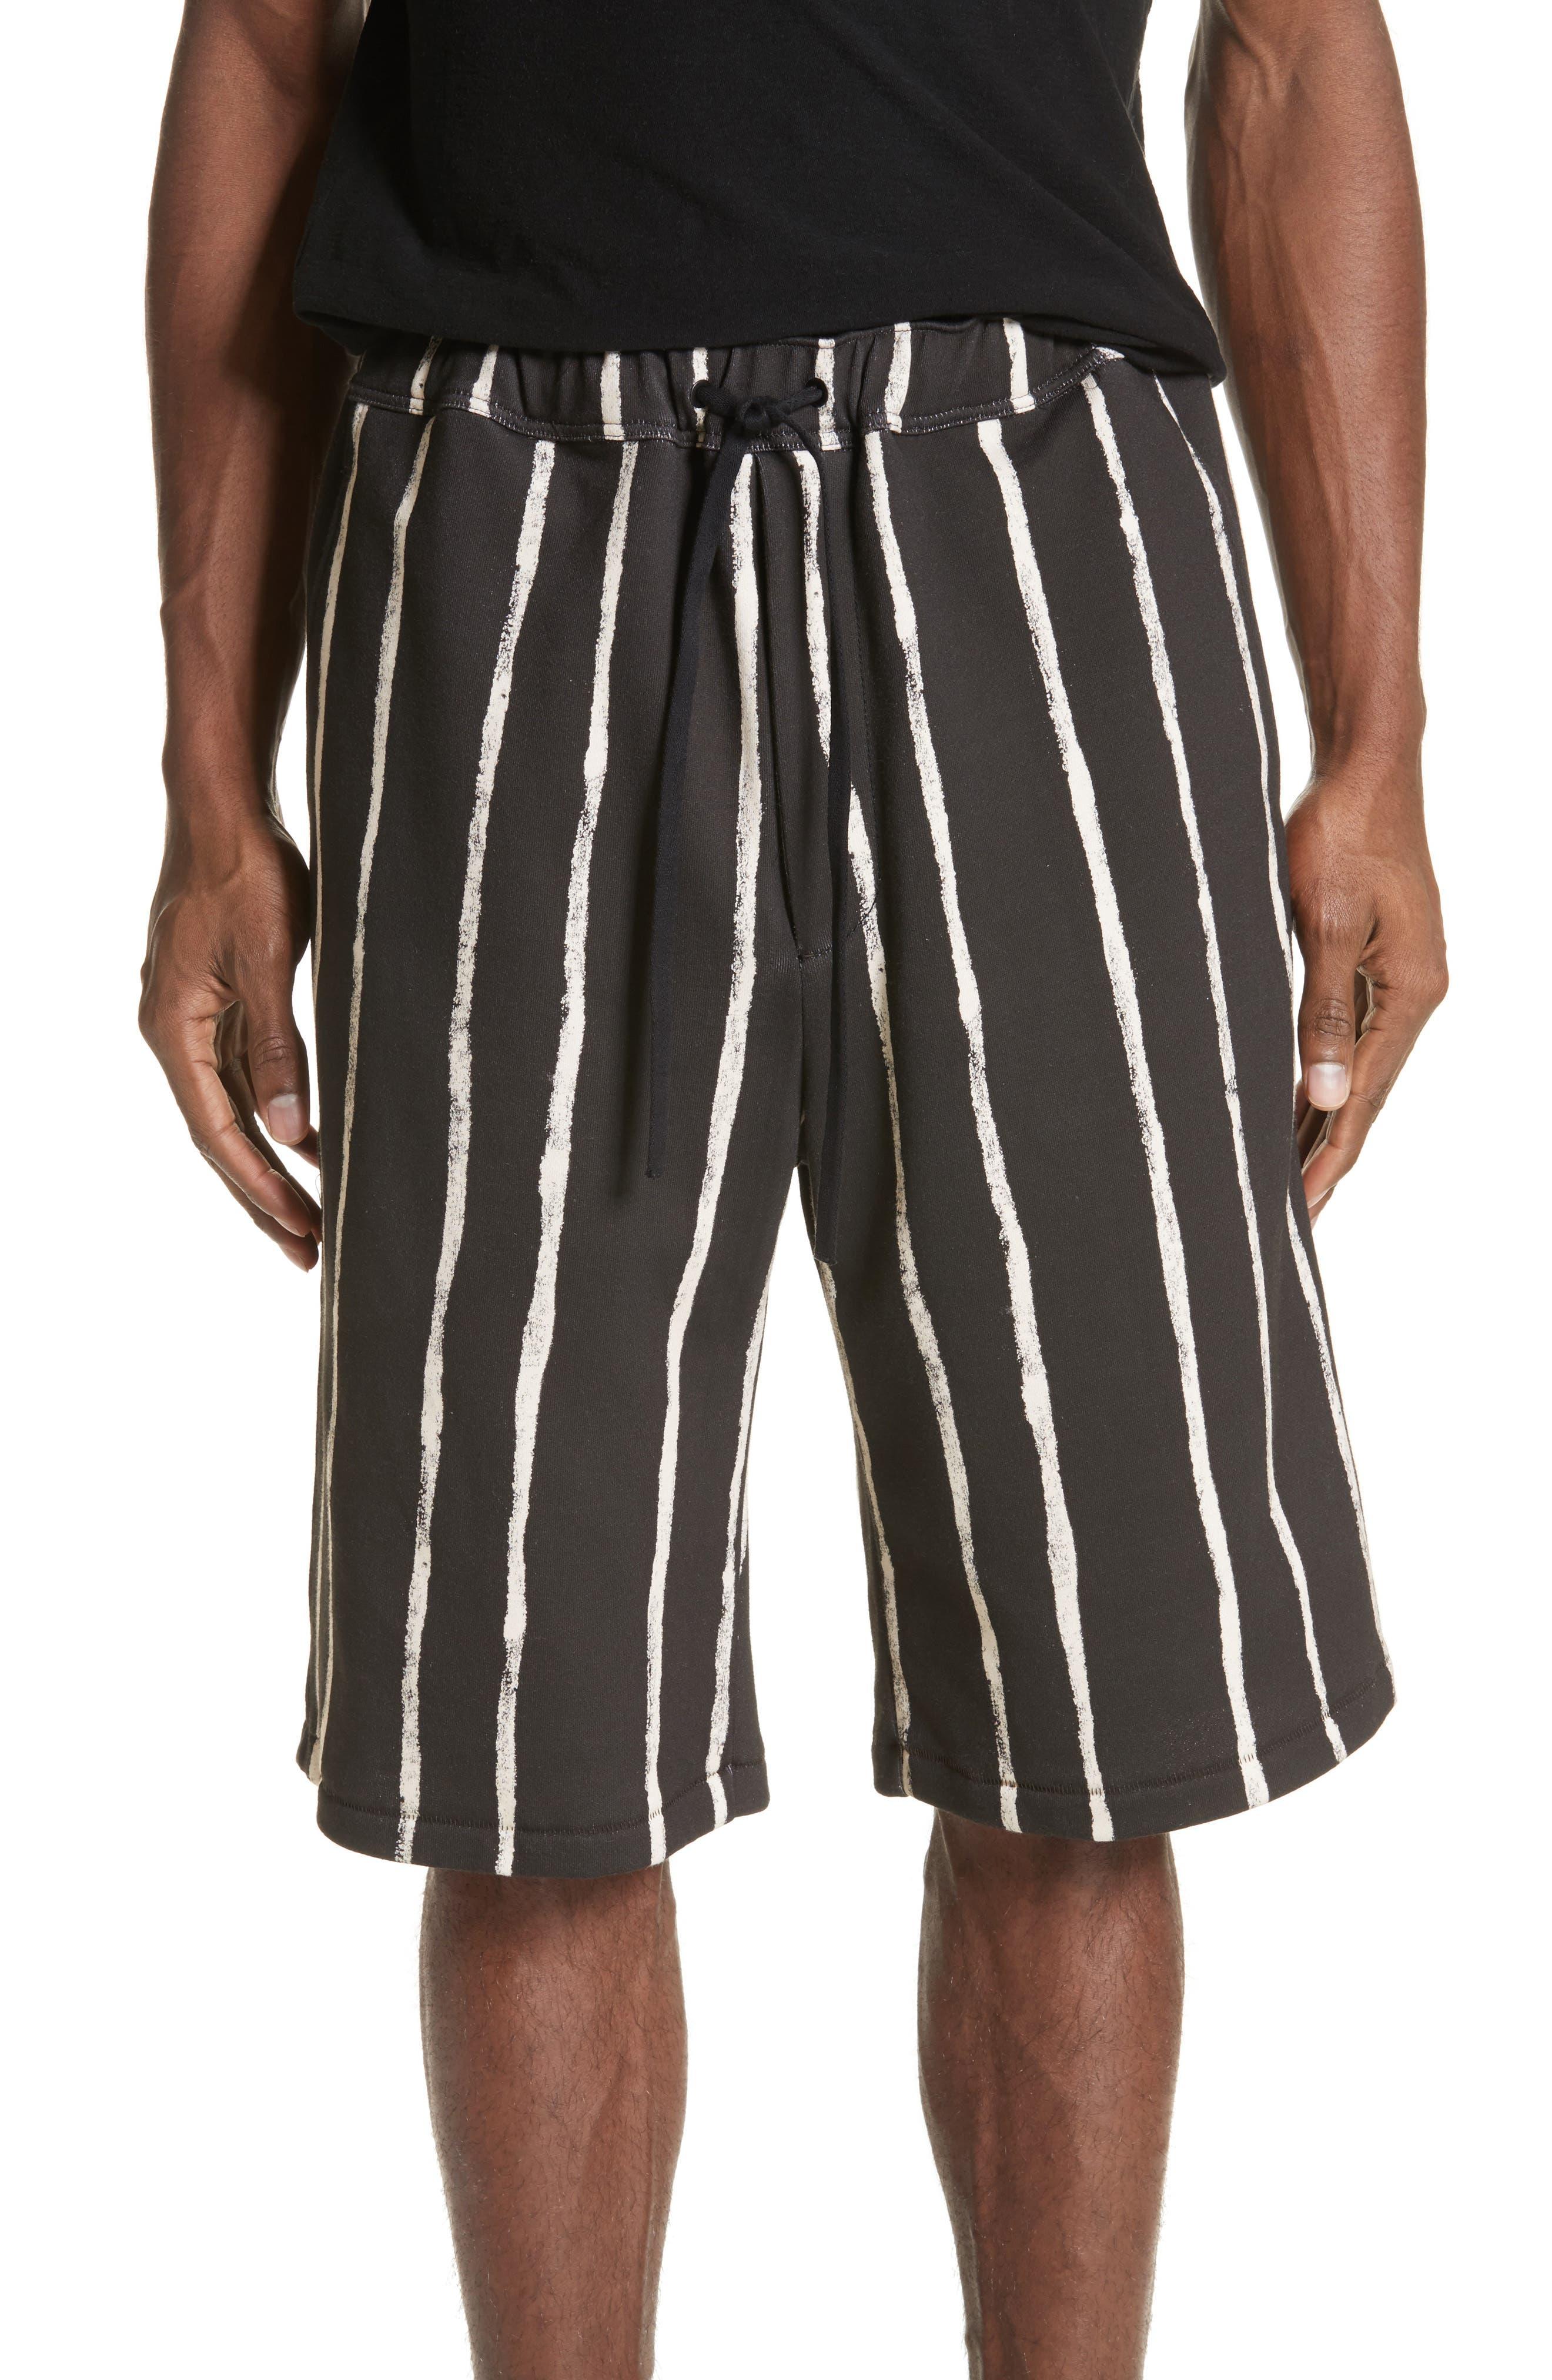 Striped Paint Shorts,                         Main,                         color, 001